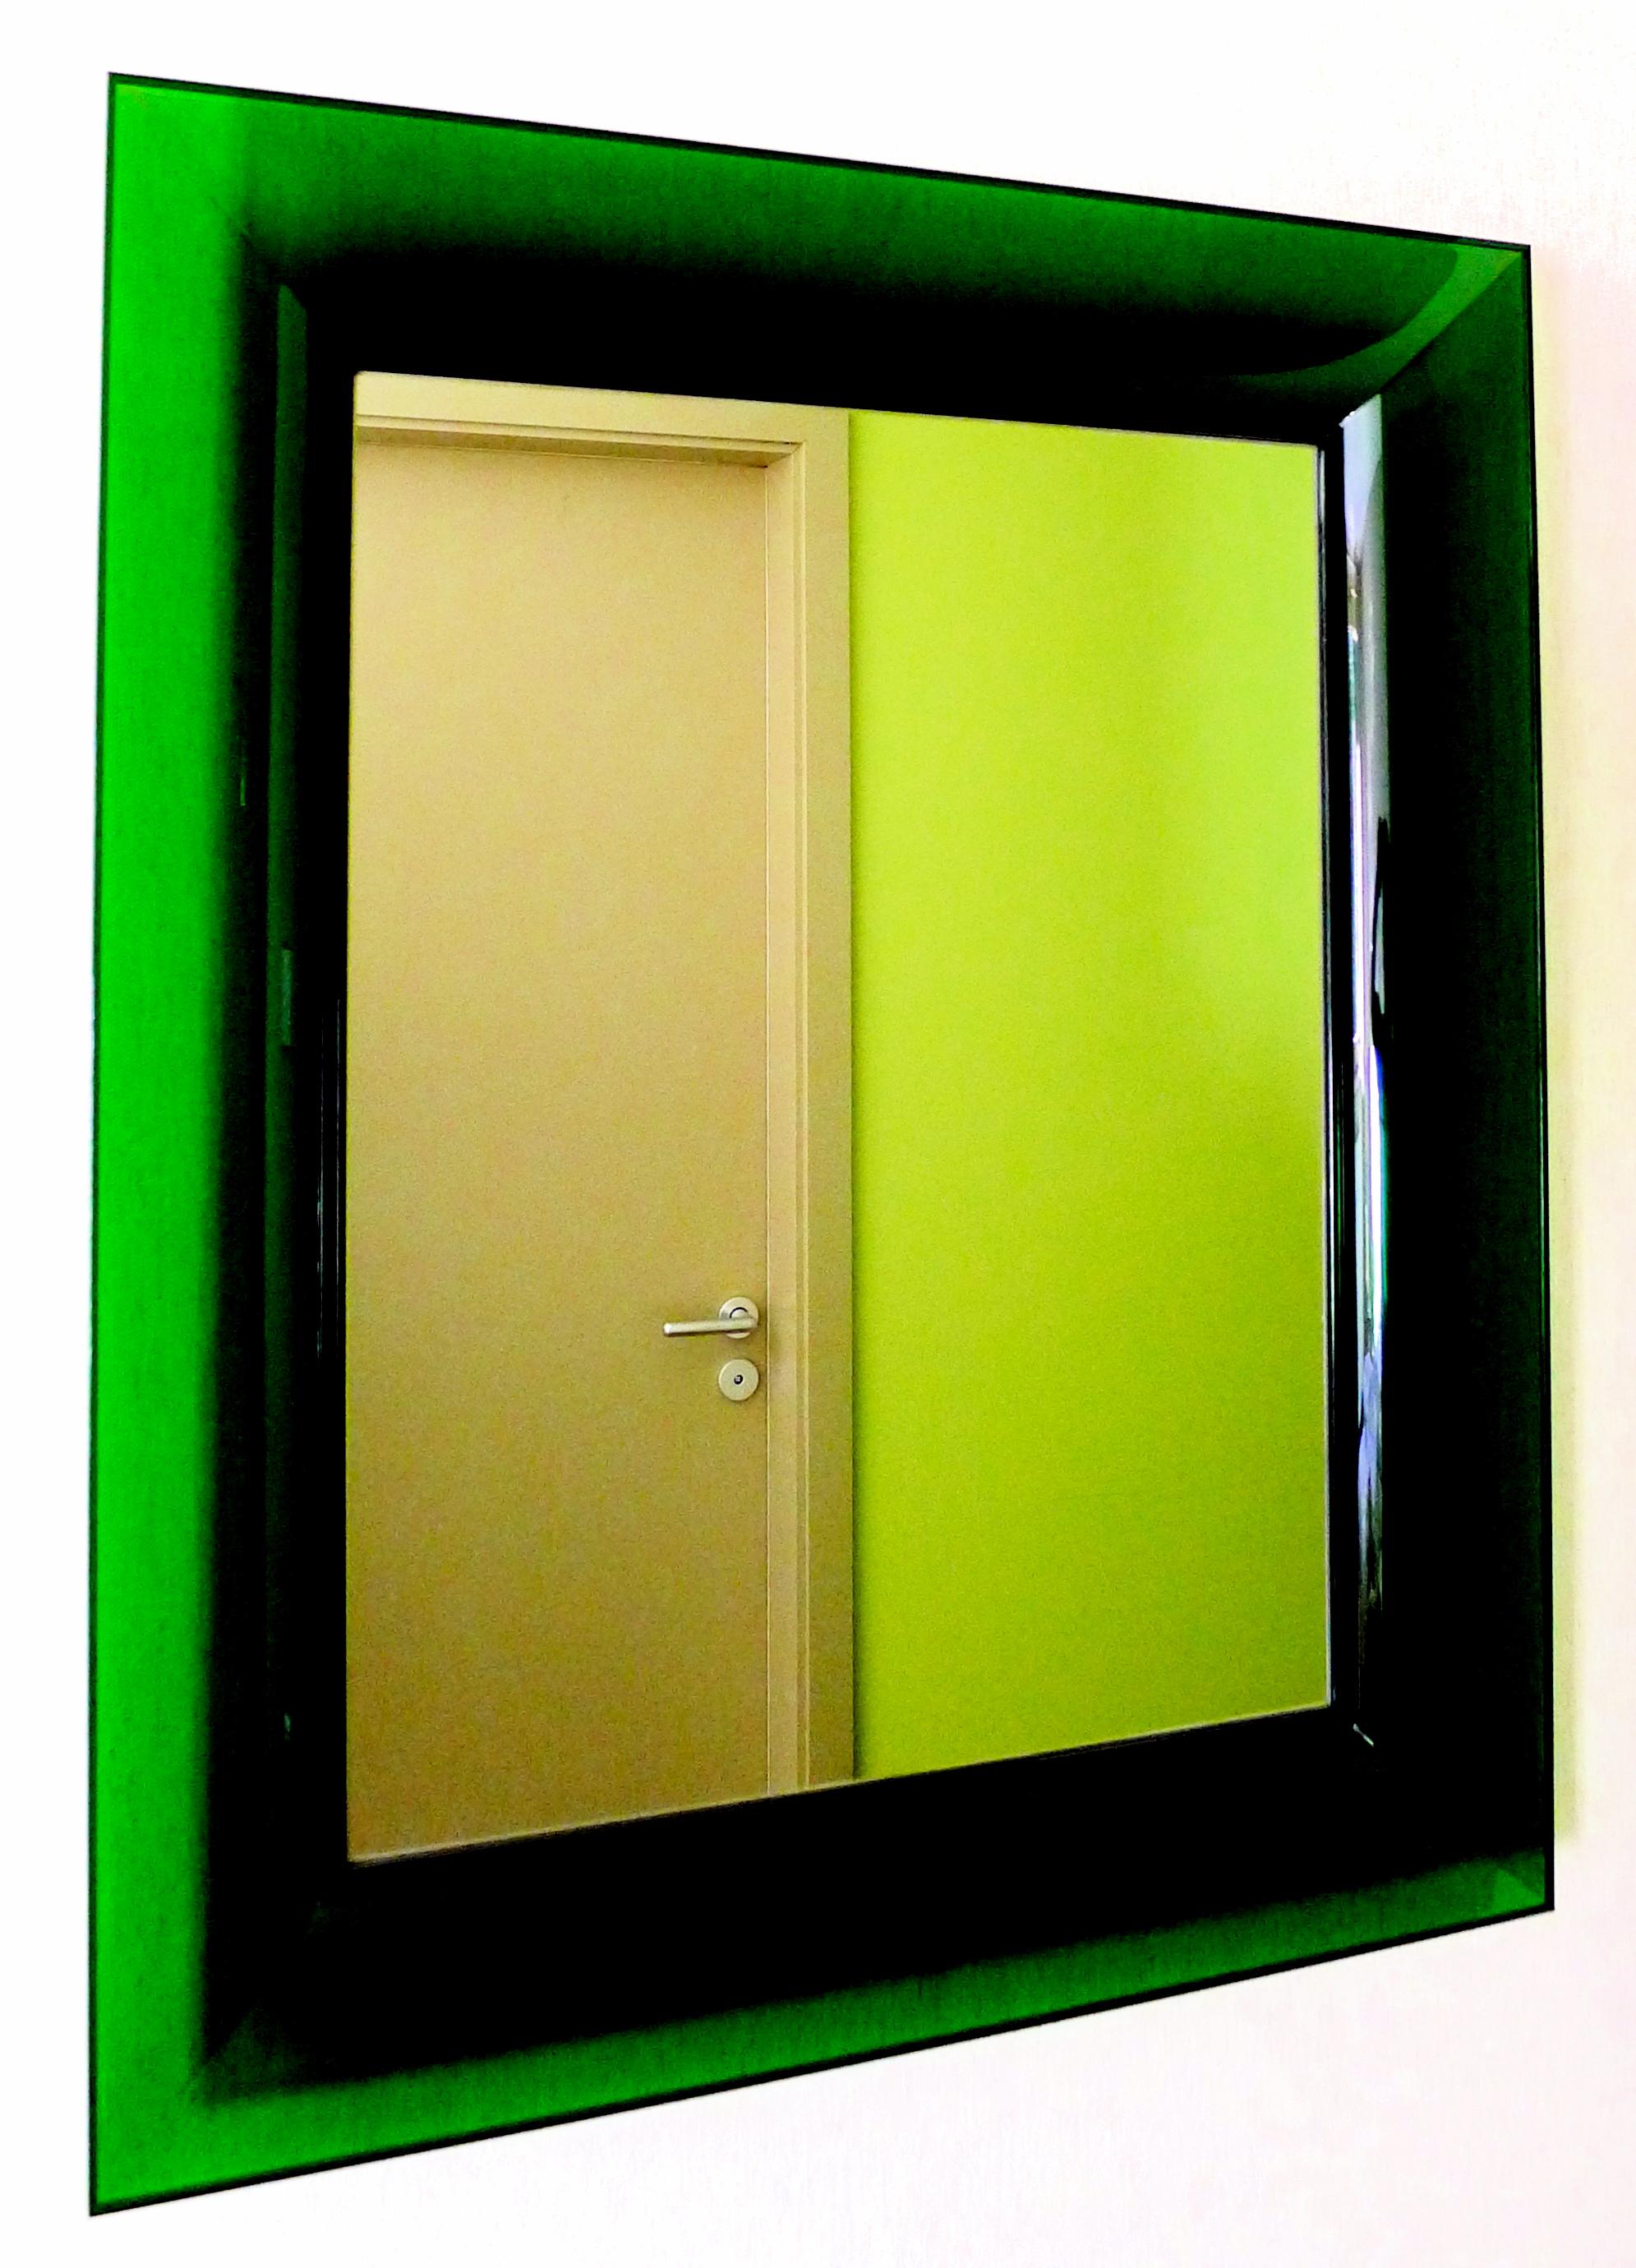 reflet porte zanygraphy of ze world. Black Bedroom Furniture Sets. Home Design Ideas